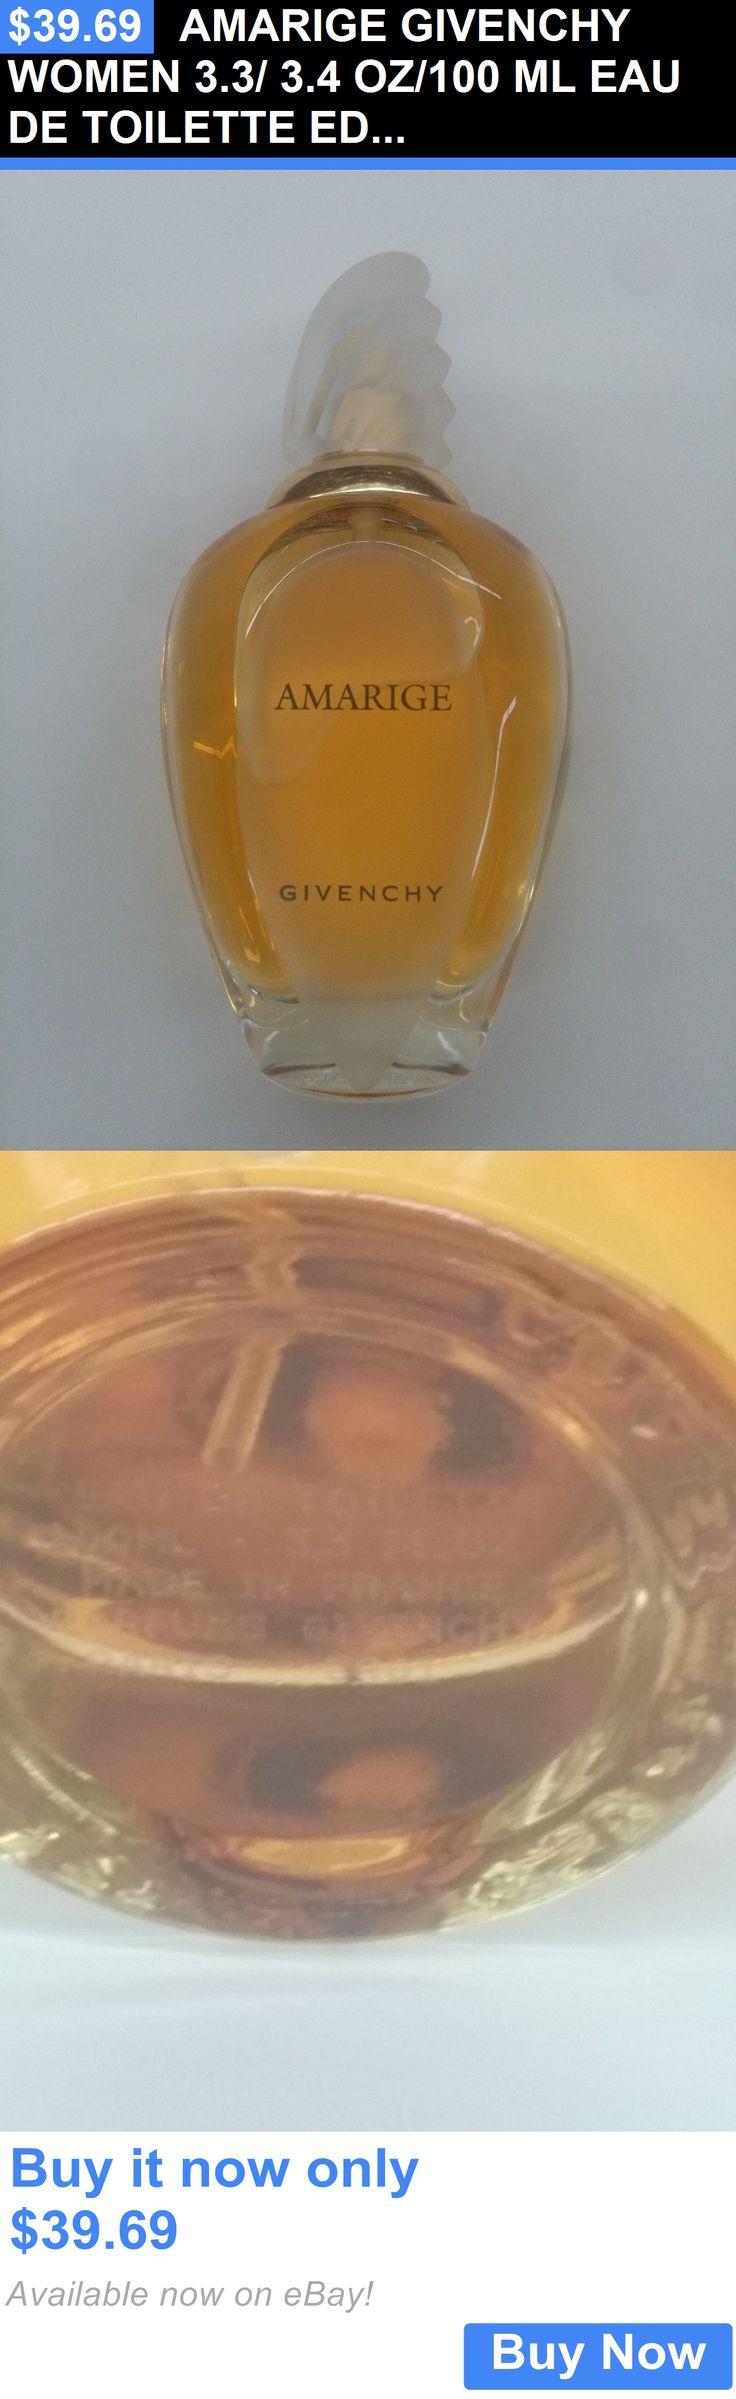 Women Fragrance: Amarige Givenchy Women 3.3/ 3.4 Oz/100 Ml Eau De Toilette Edt Spray As Pictured BUY IT NOW ONLY: $39.69